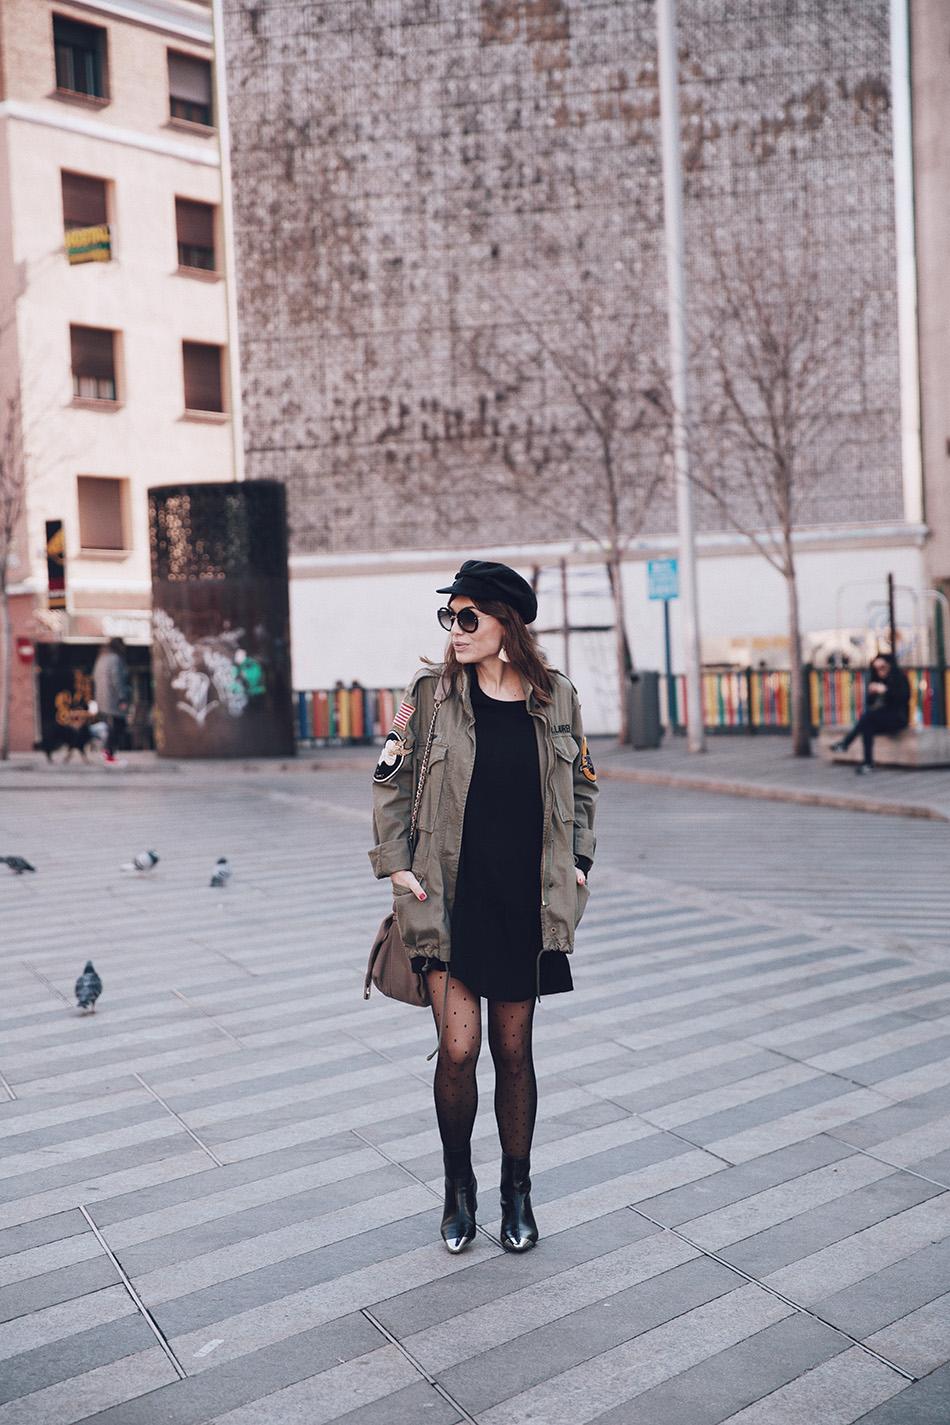 Bárbara Crespo street style / Military jacket / Chaqueta militar: Ralph Lauren. LBD / Vestido: Mango. Botas / Boots: Mango. Pendientes / Earrings: Mango Bolso / Bag: Purificación Garcia Gafas de sol / Sunglasses: Miu Miu Cap / Gorra marinera: Zara